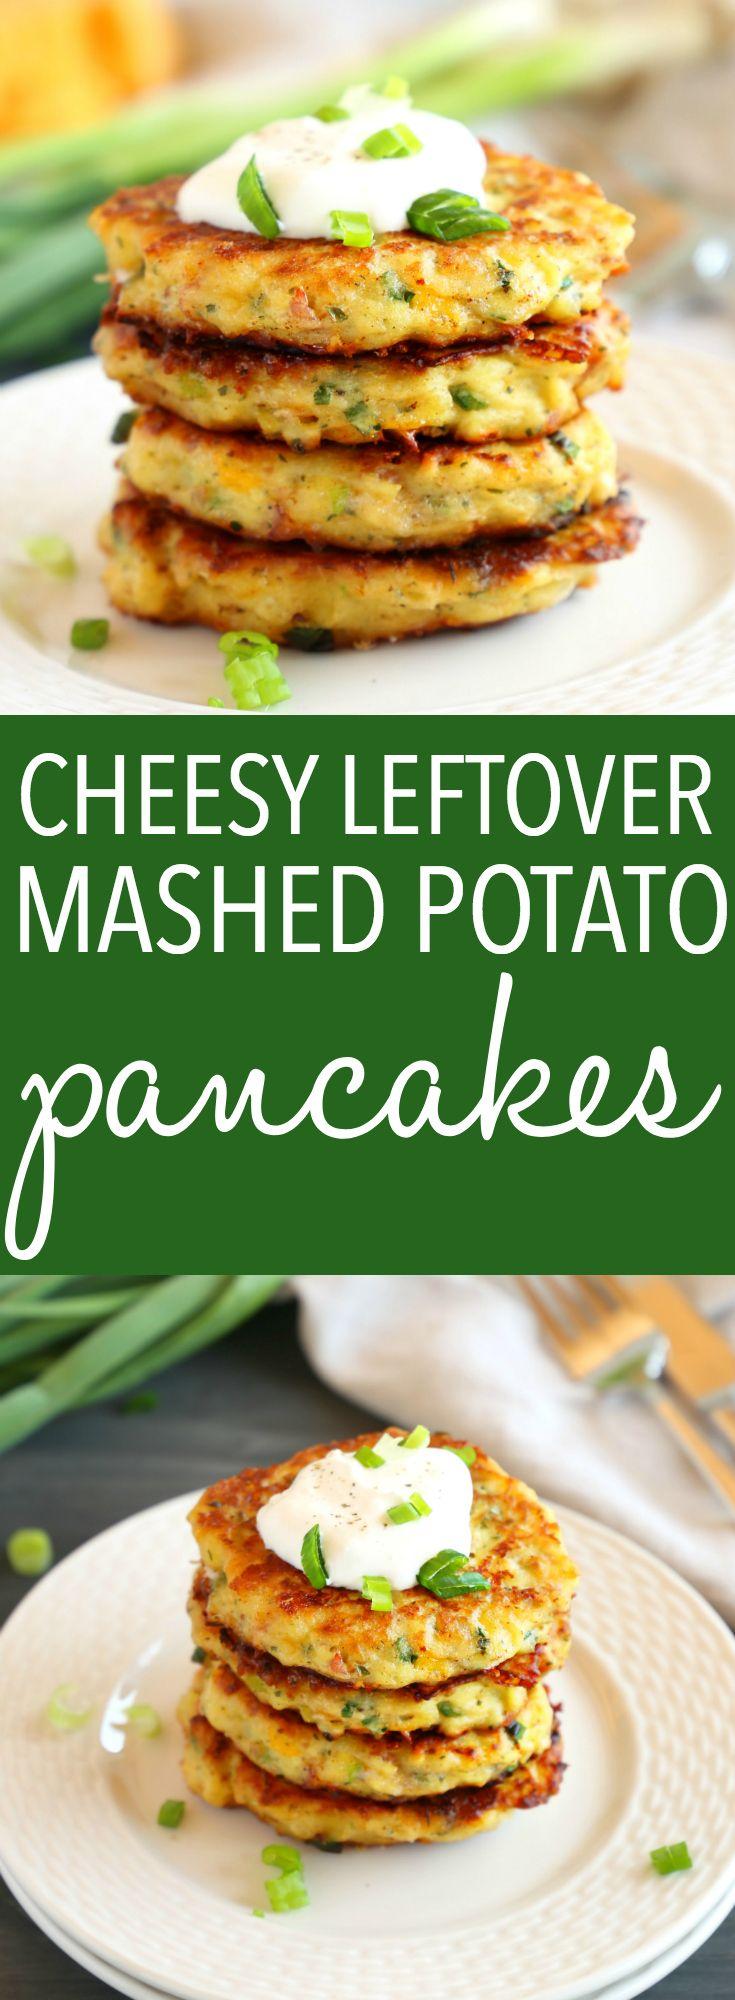 Cheesy Leftover Mashed Potato Pancakes These Chees